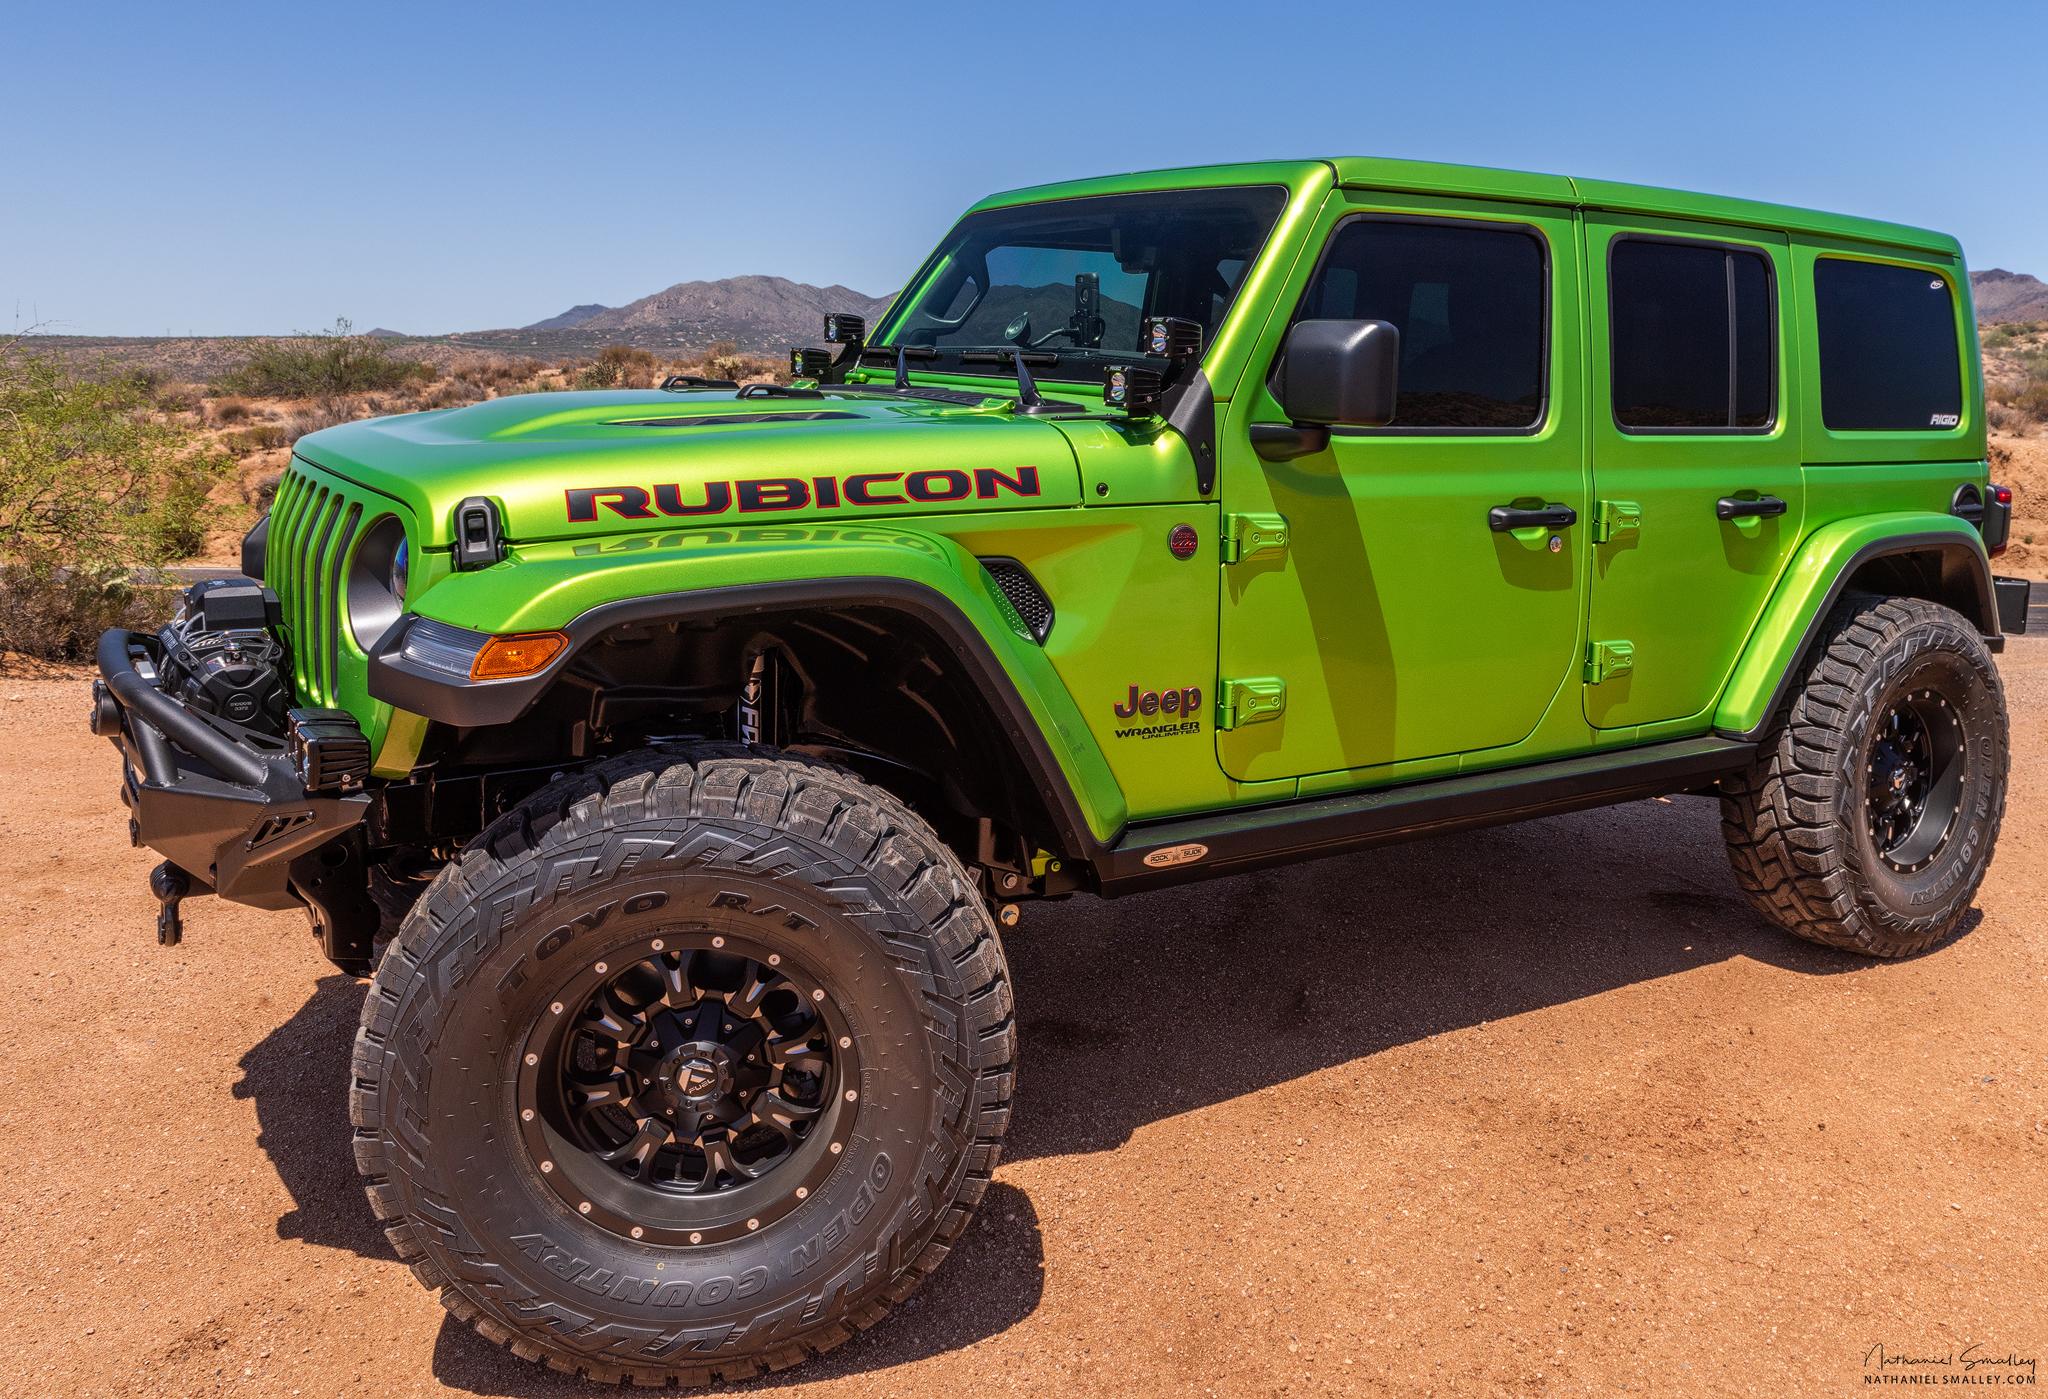 2018 Jeep Wrangler Rubicon JL